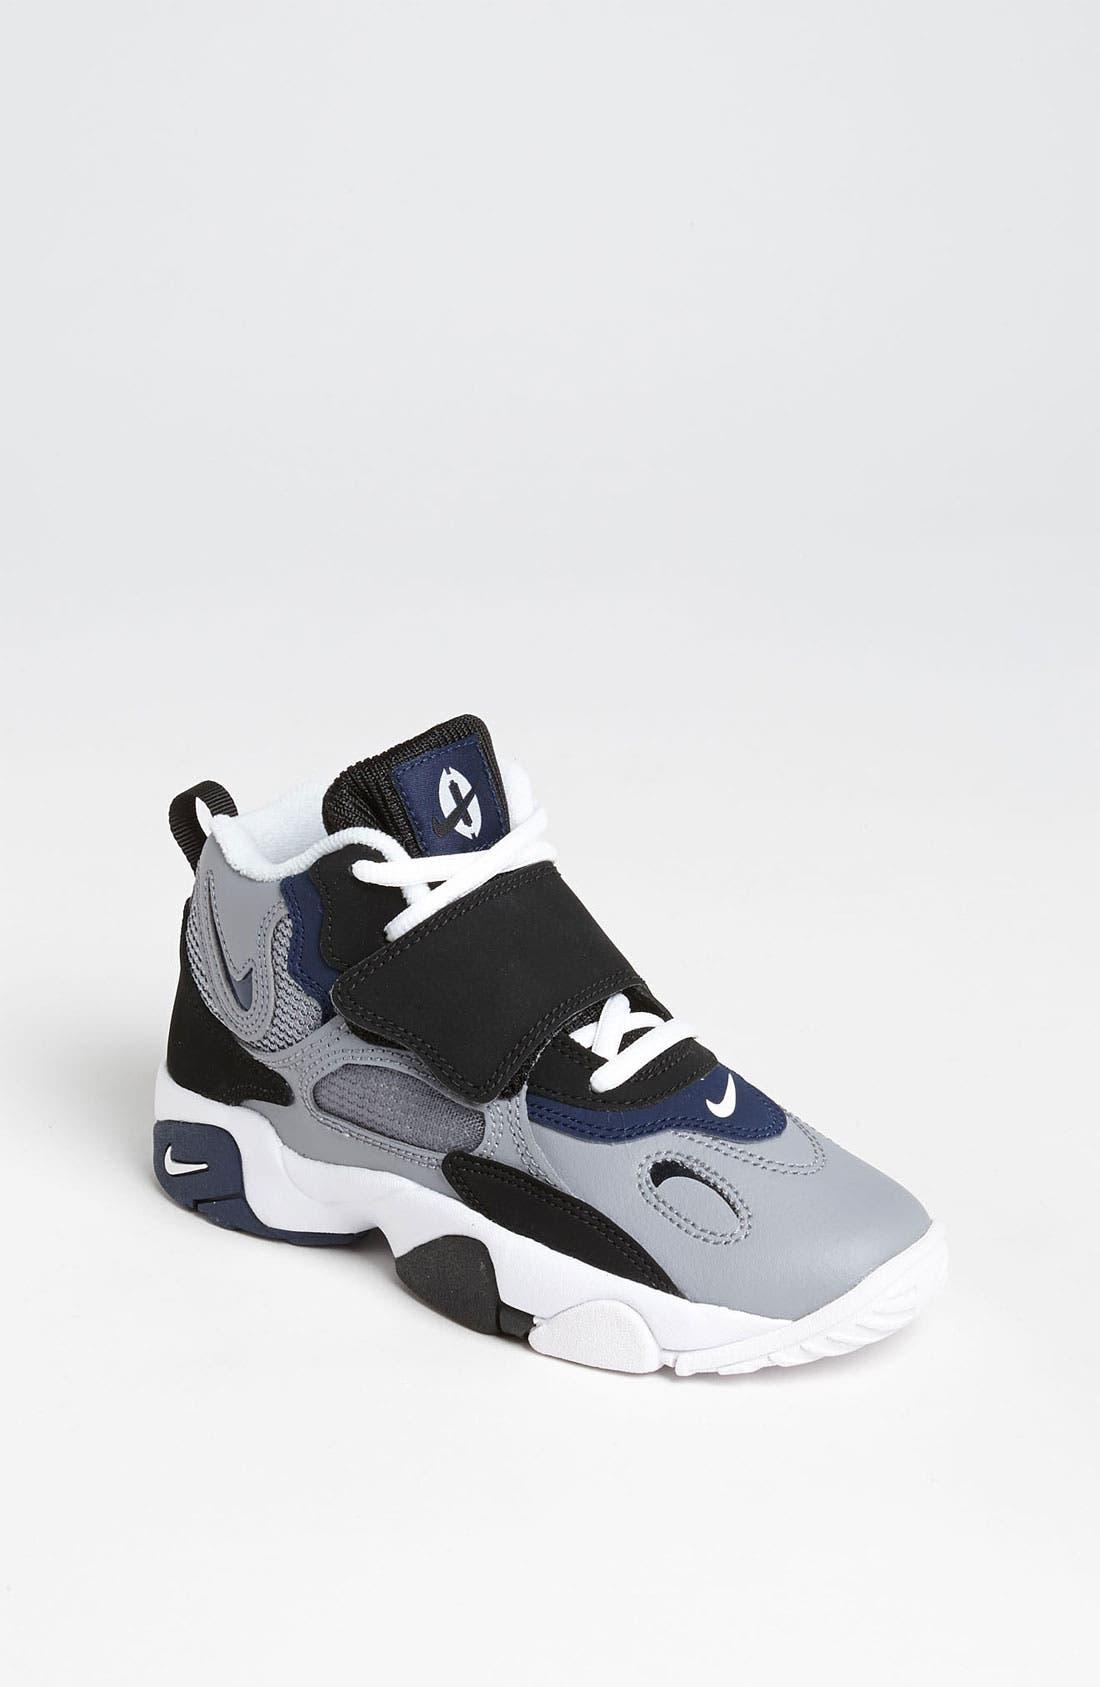 Alternate Image 1 Selected - Nike 'Speed Turf' Sneaker (Toddler & Little Kid)